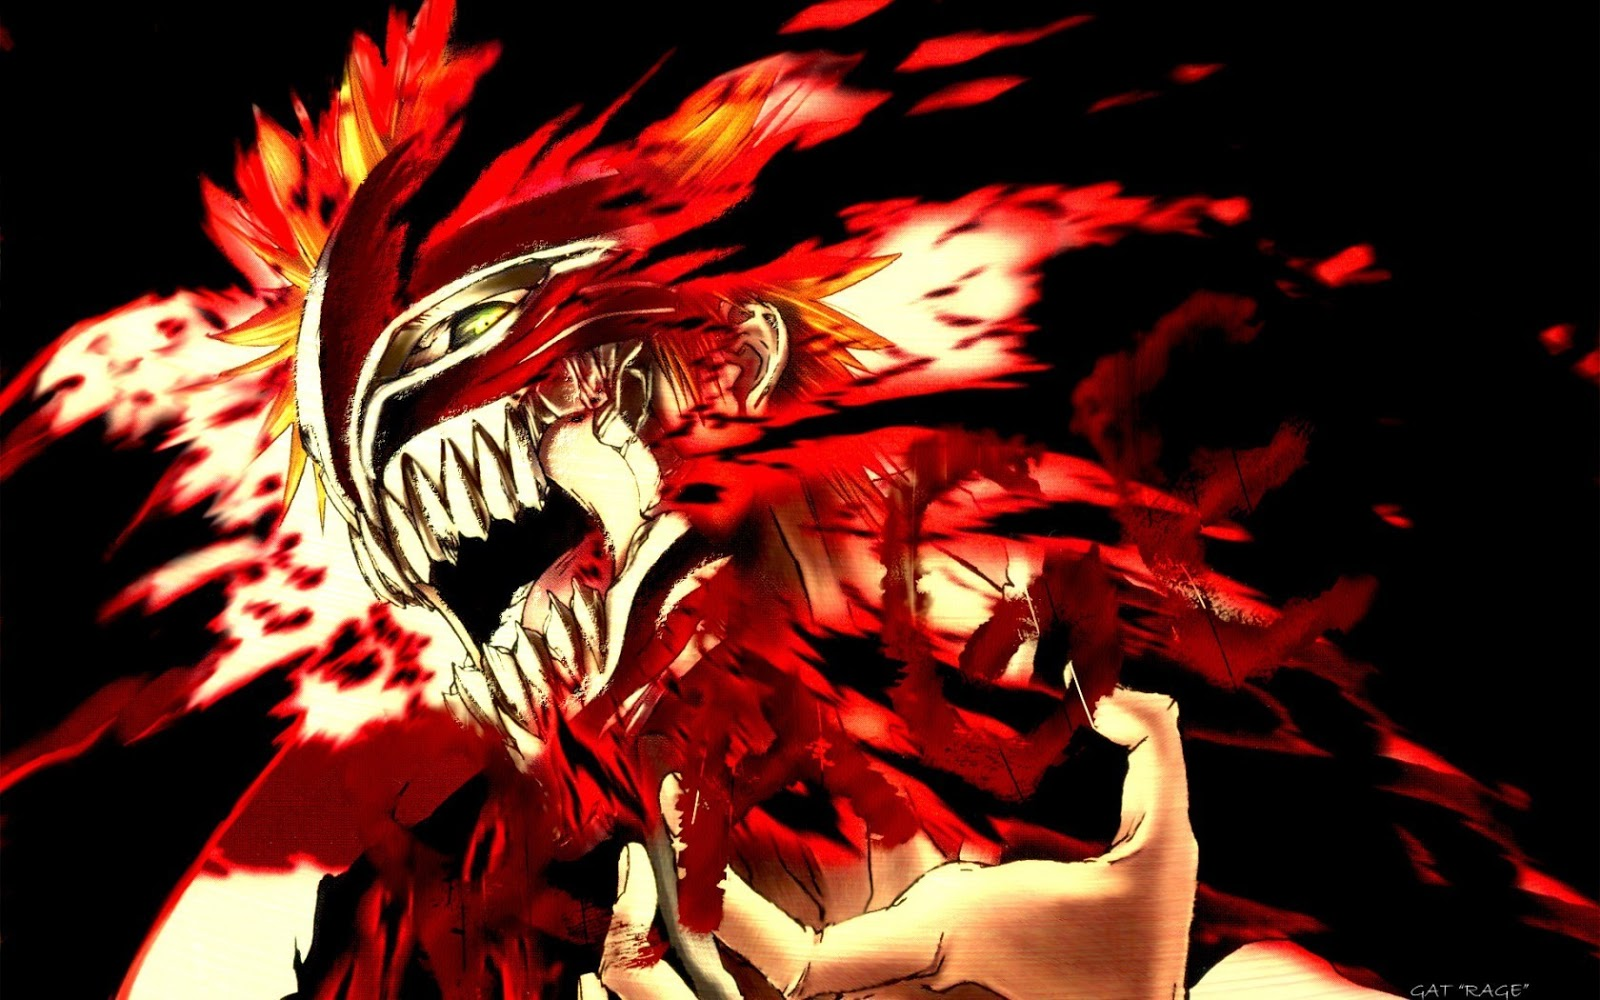 Amazing Anime Wallpapers - WallpaperSafari